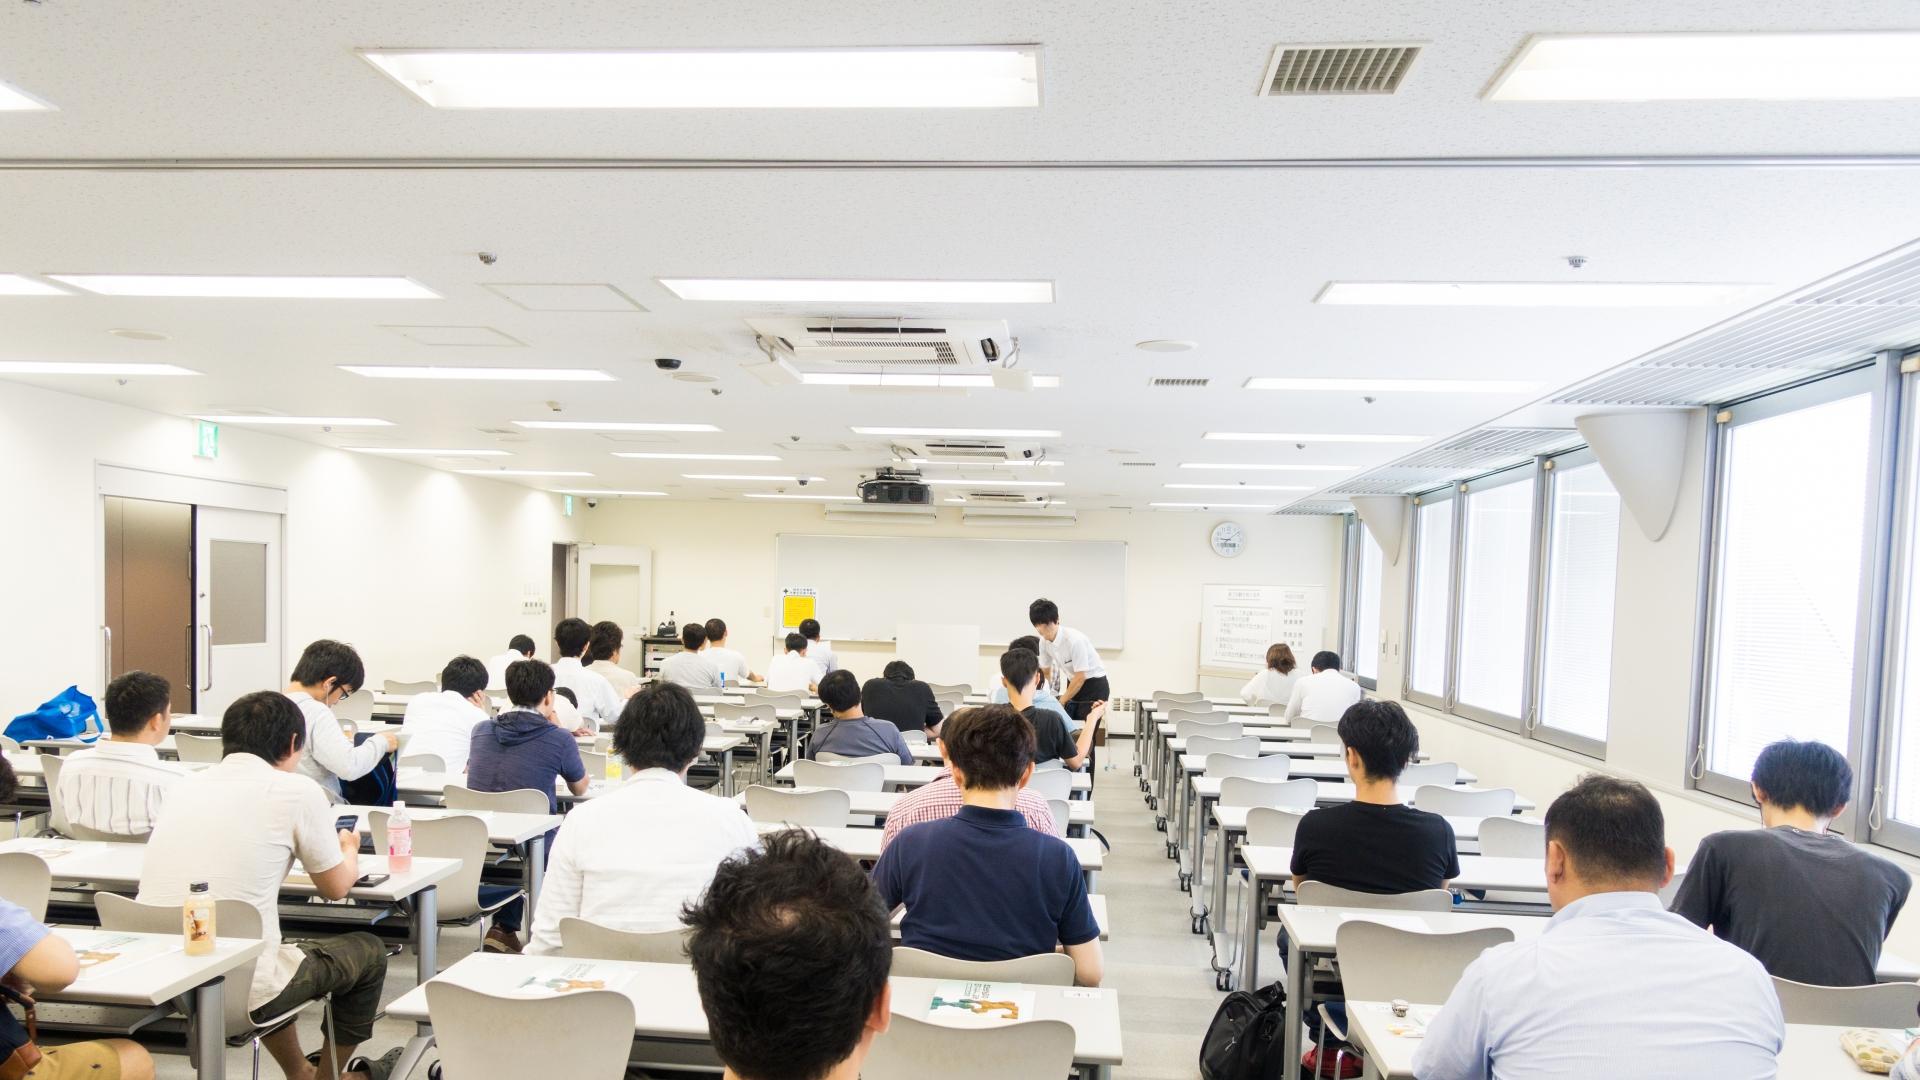 【英語研修】法人向け社内英語研修サービス14社徹底比較!